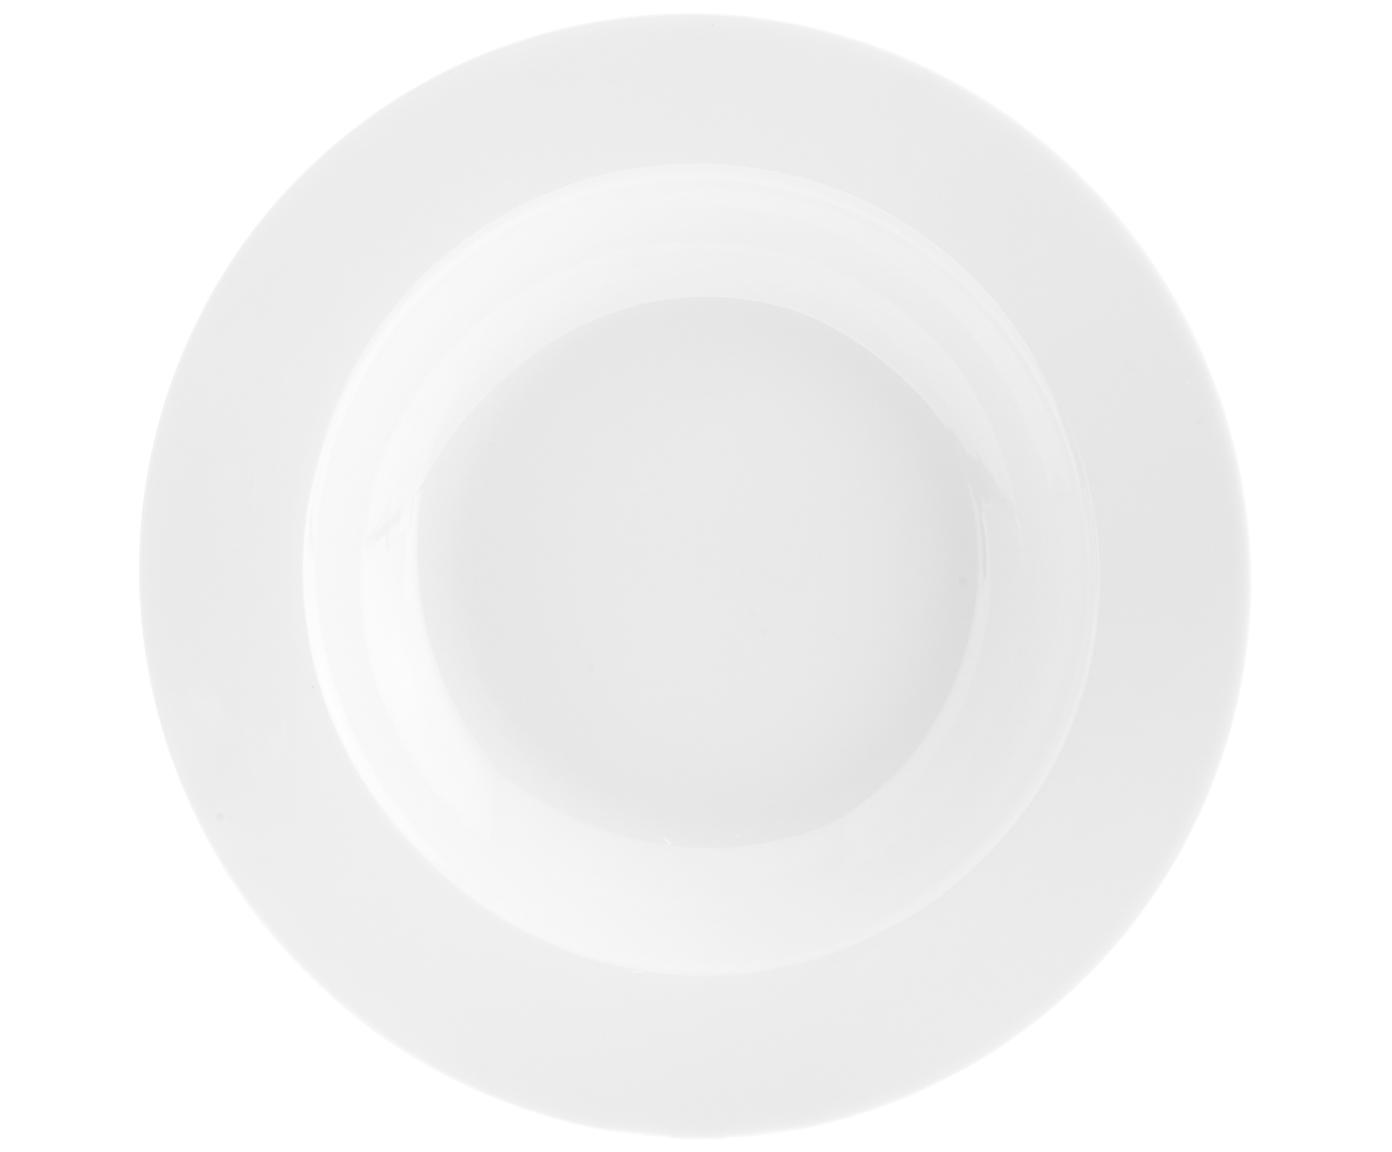 Piatto fondo Delight Classic 2 pz, Porcellana, Bianco, Ø 23 x Alt. 4 cm